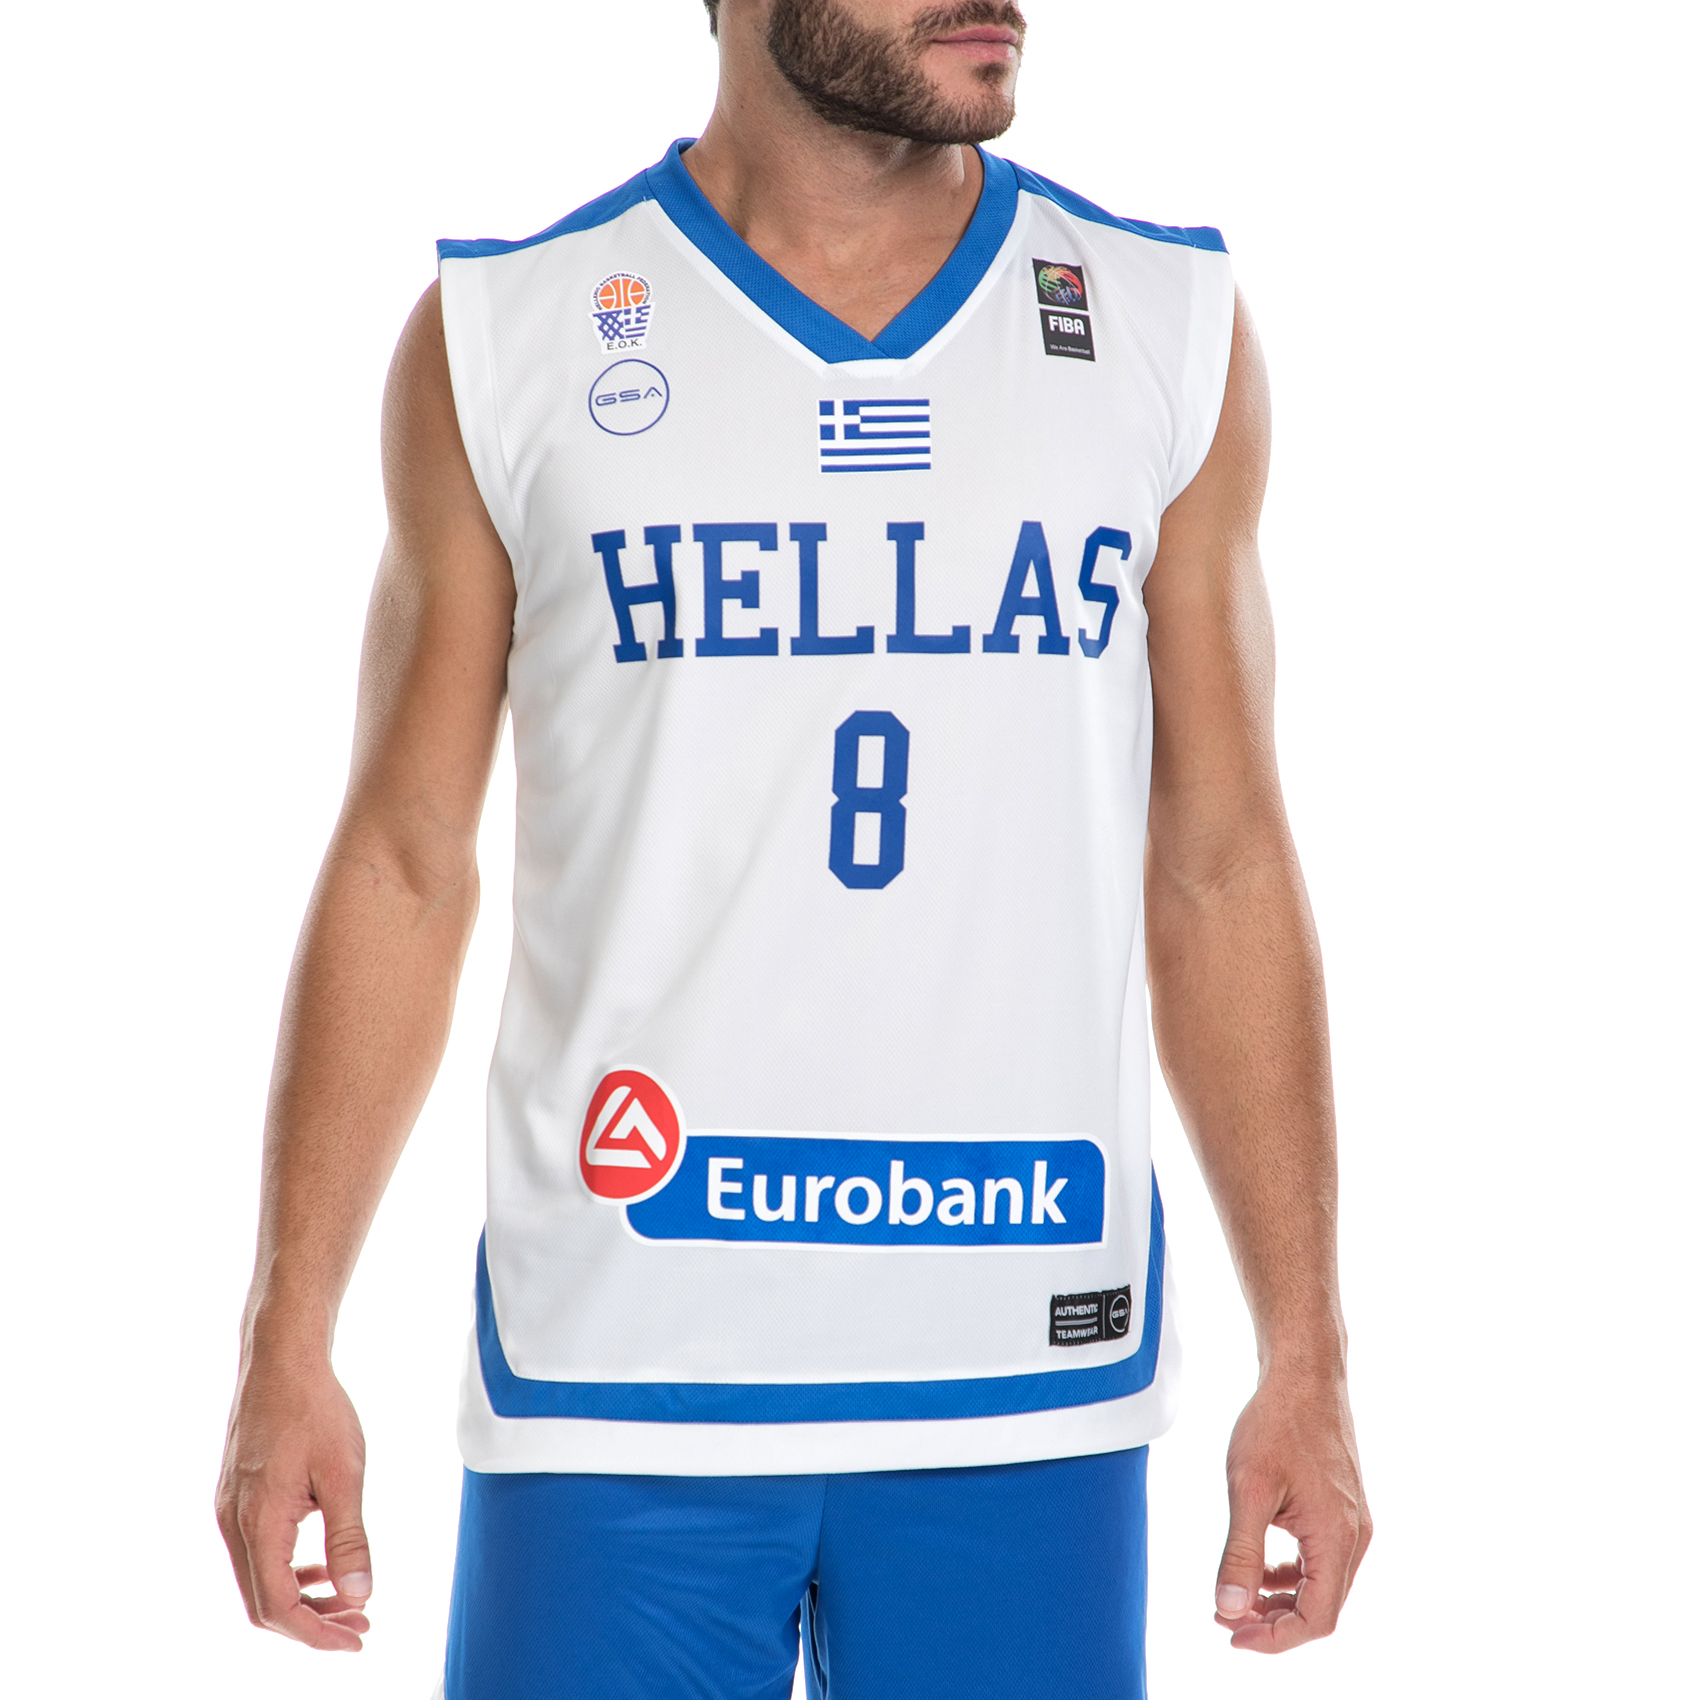 GSA - Ανδρική μπλούζα της Εθνικής Ελλάδος Basket ΚΑΛΑΘΗ λευκή ανδρικά ρούχα αθλητικά t shirt